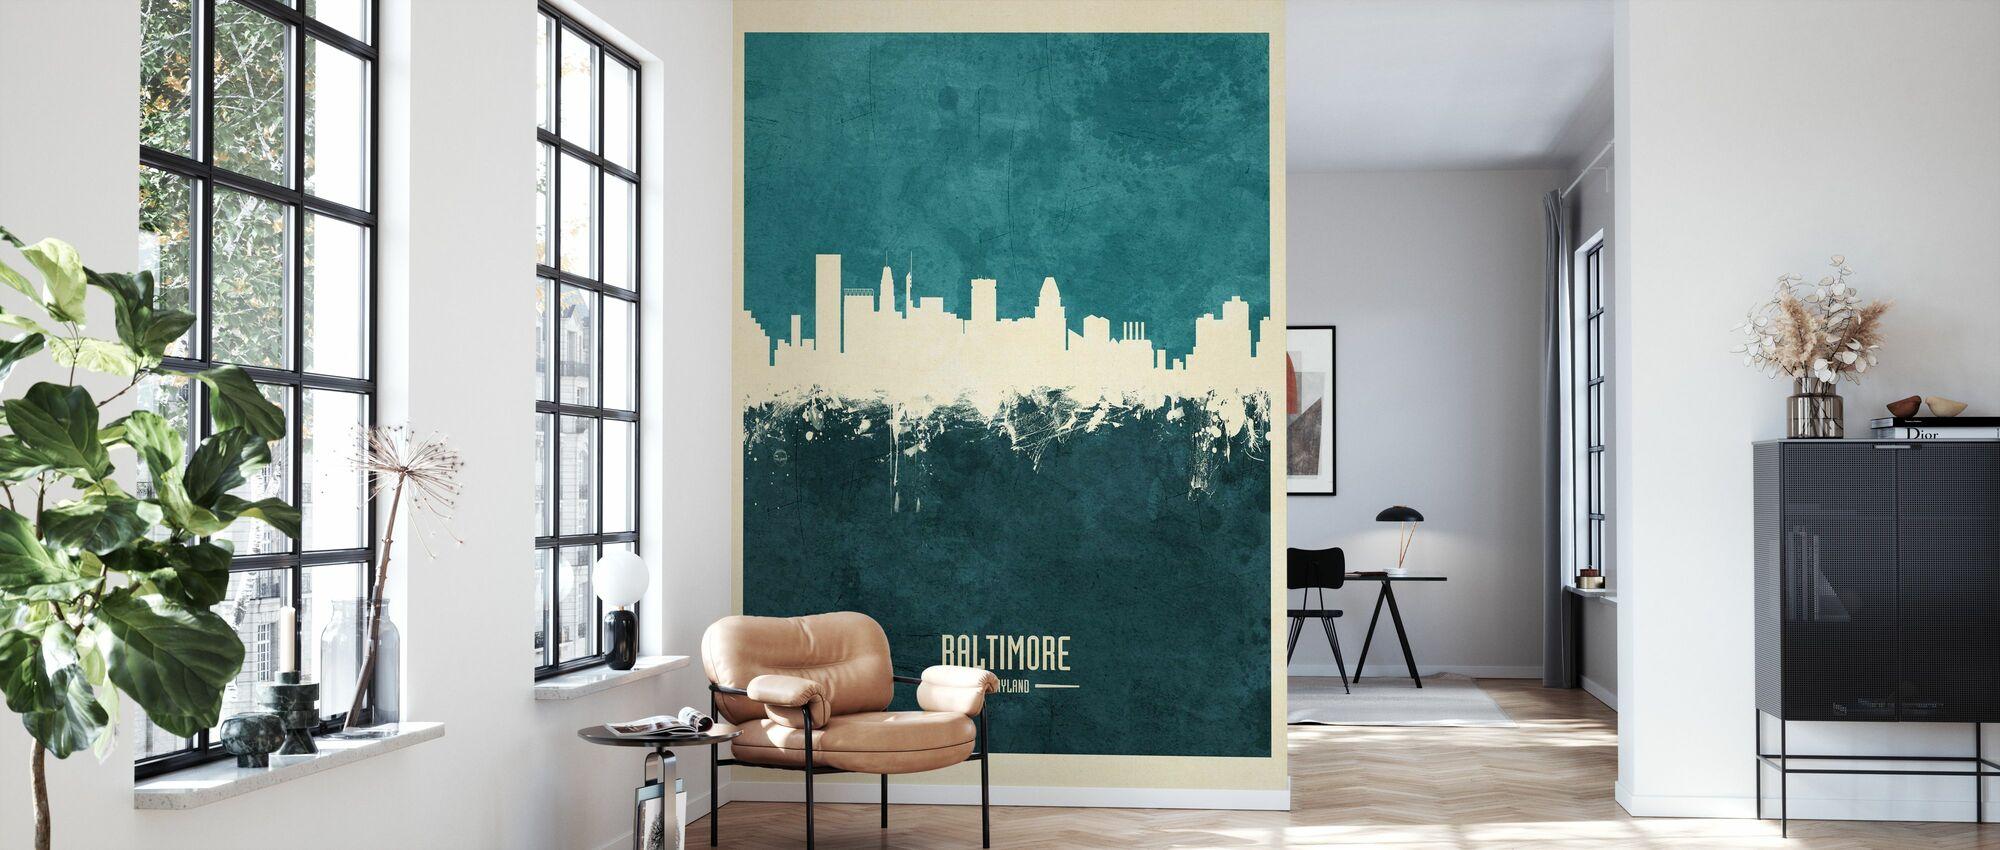 Baltimore Maryland Skyline Blue - Wallpaper - Living Room